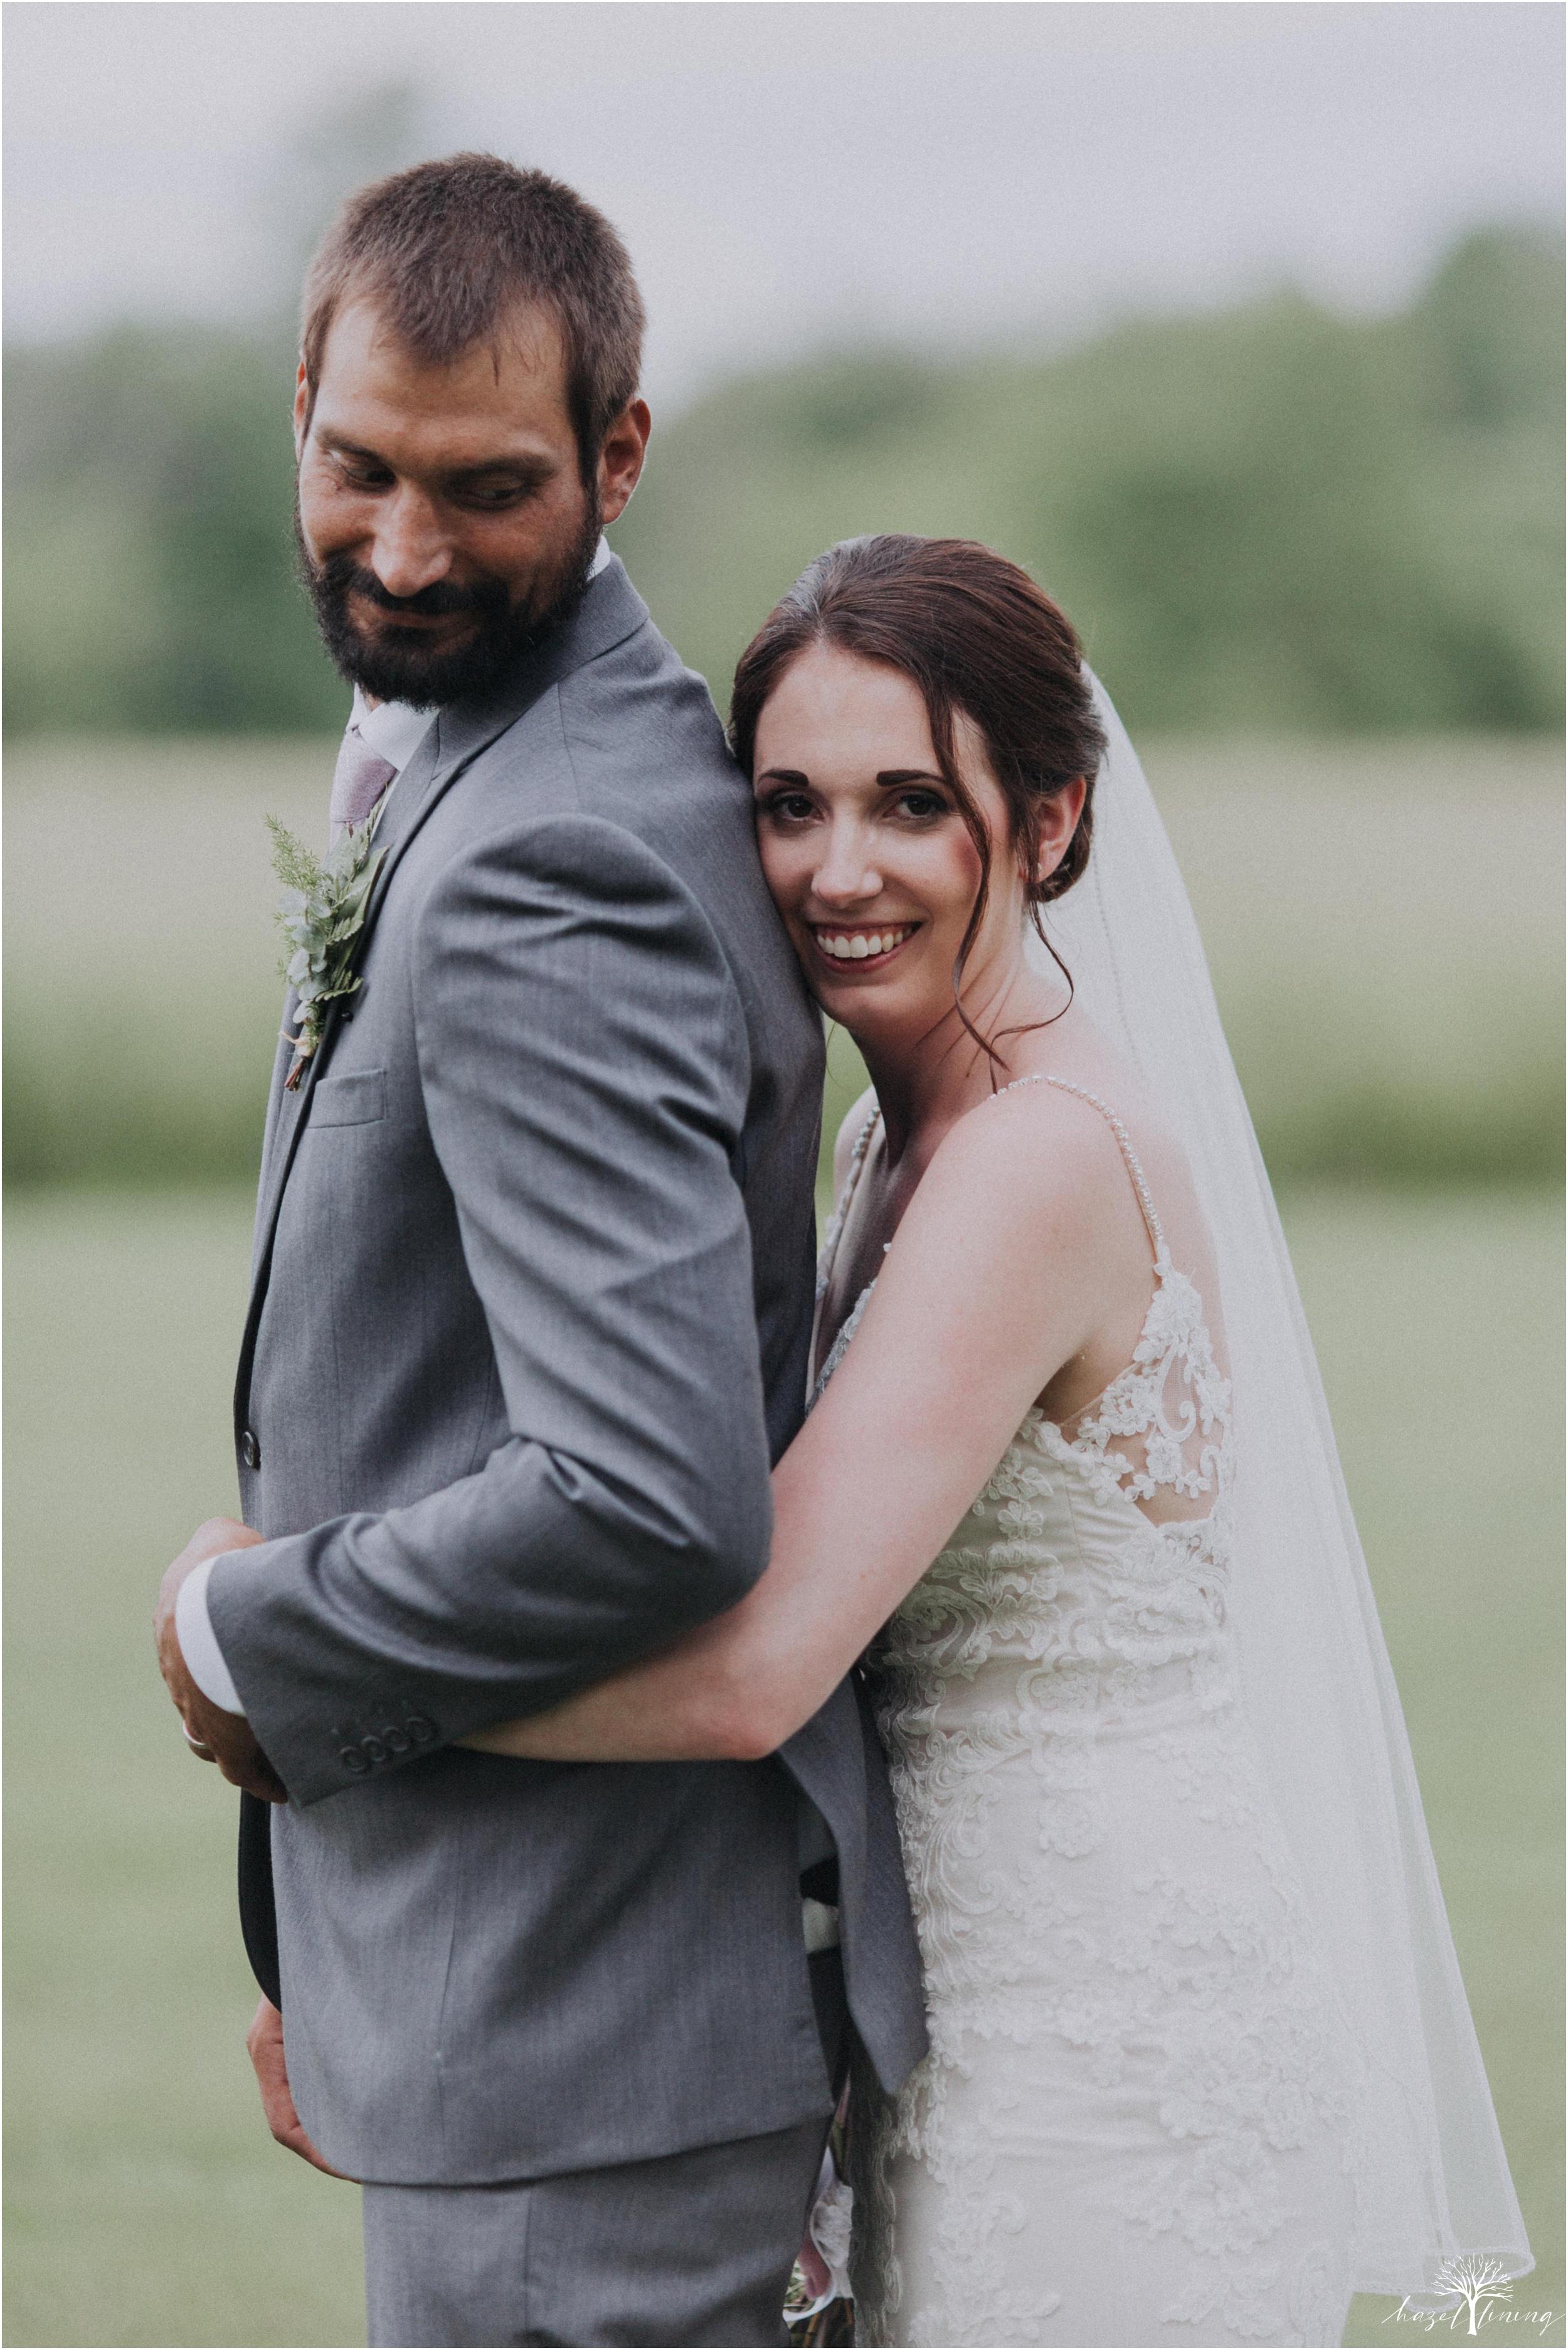 hazel-lining-travel-wedding-elopement-photography-lisa-landon-shoemaker-the-farm-bakery-and-events-bucks-county-quakertown-pennsylvania-summer-country-outdoor-farm-wedding_0089.jpg